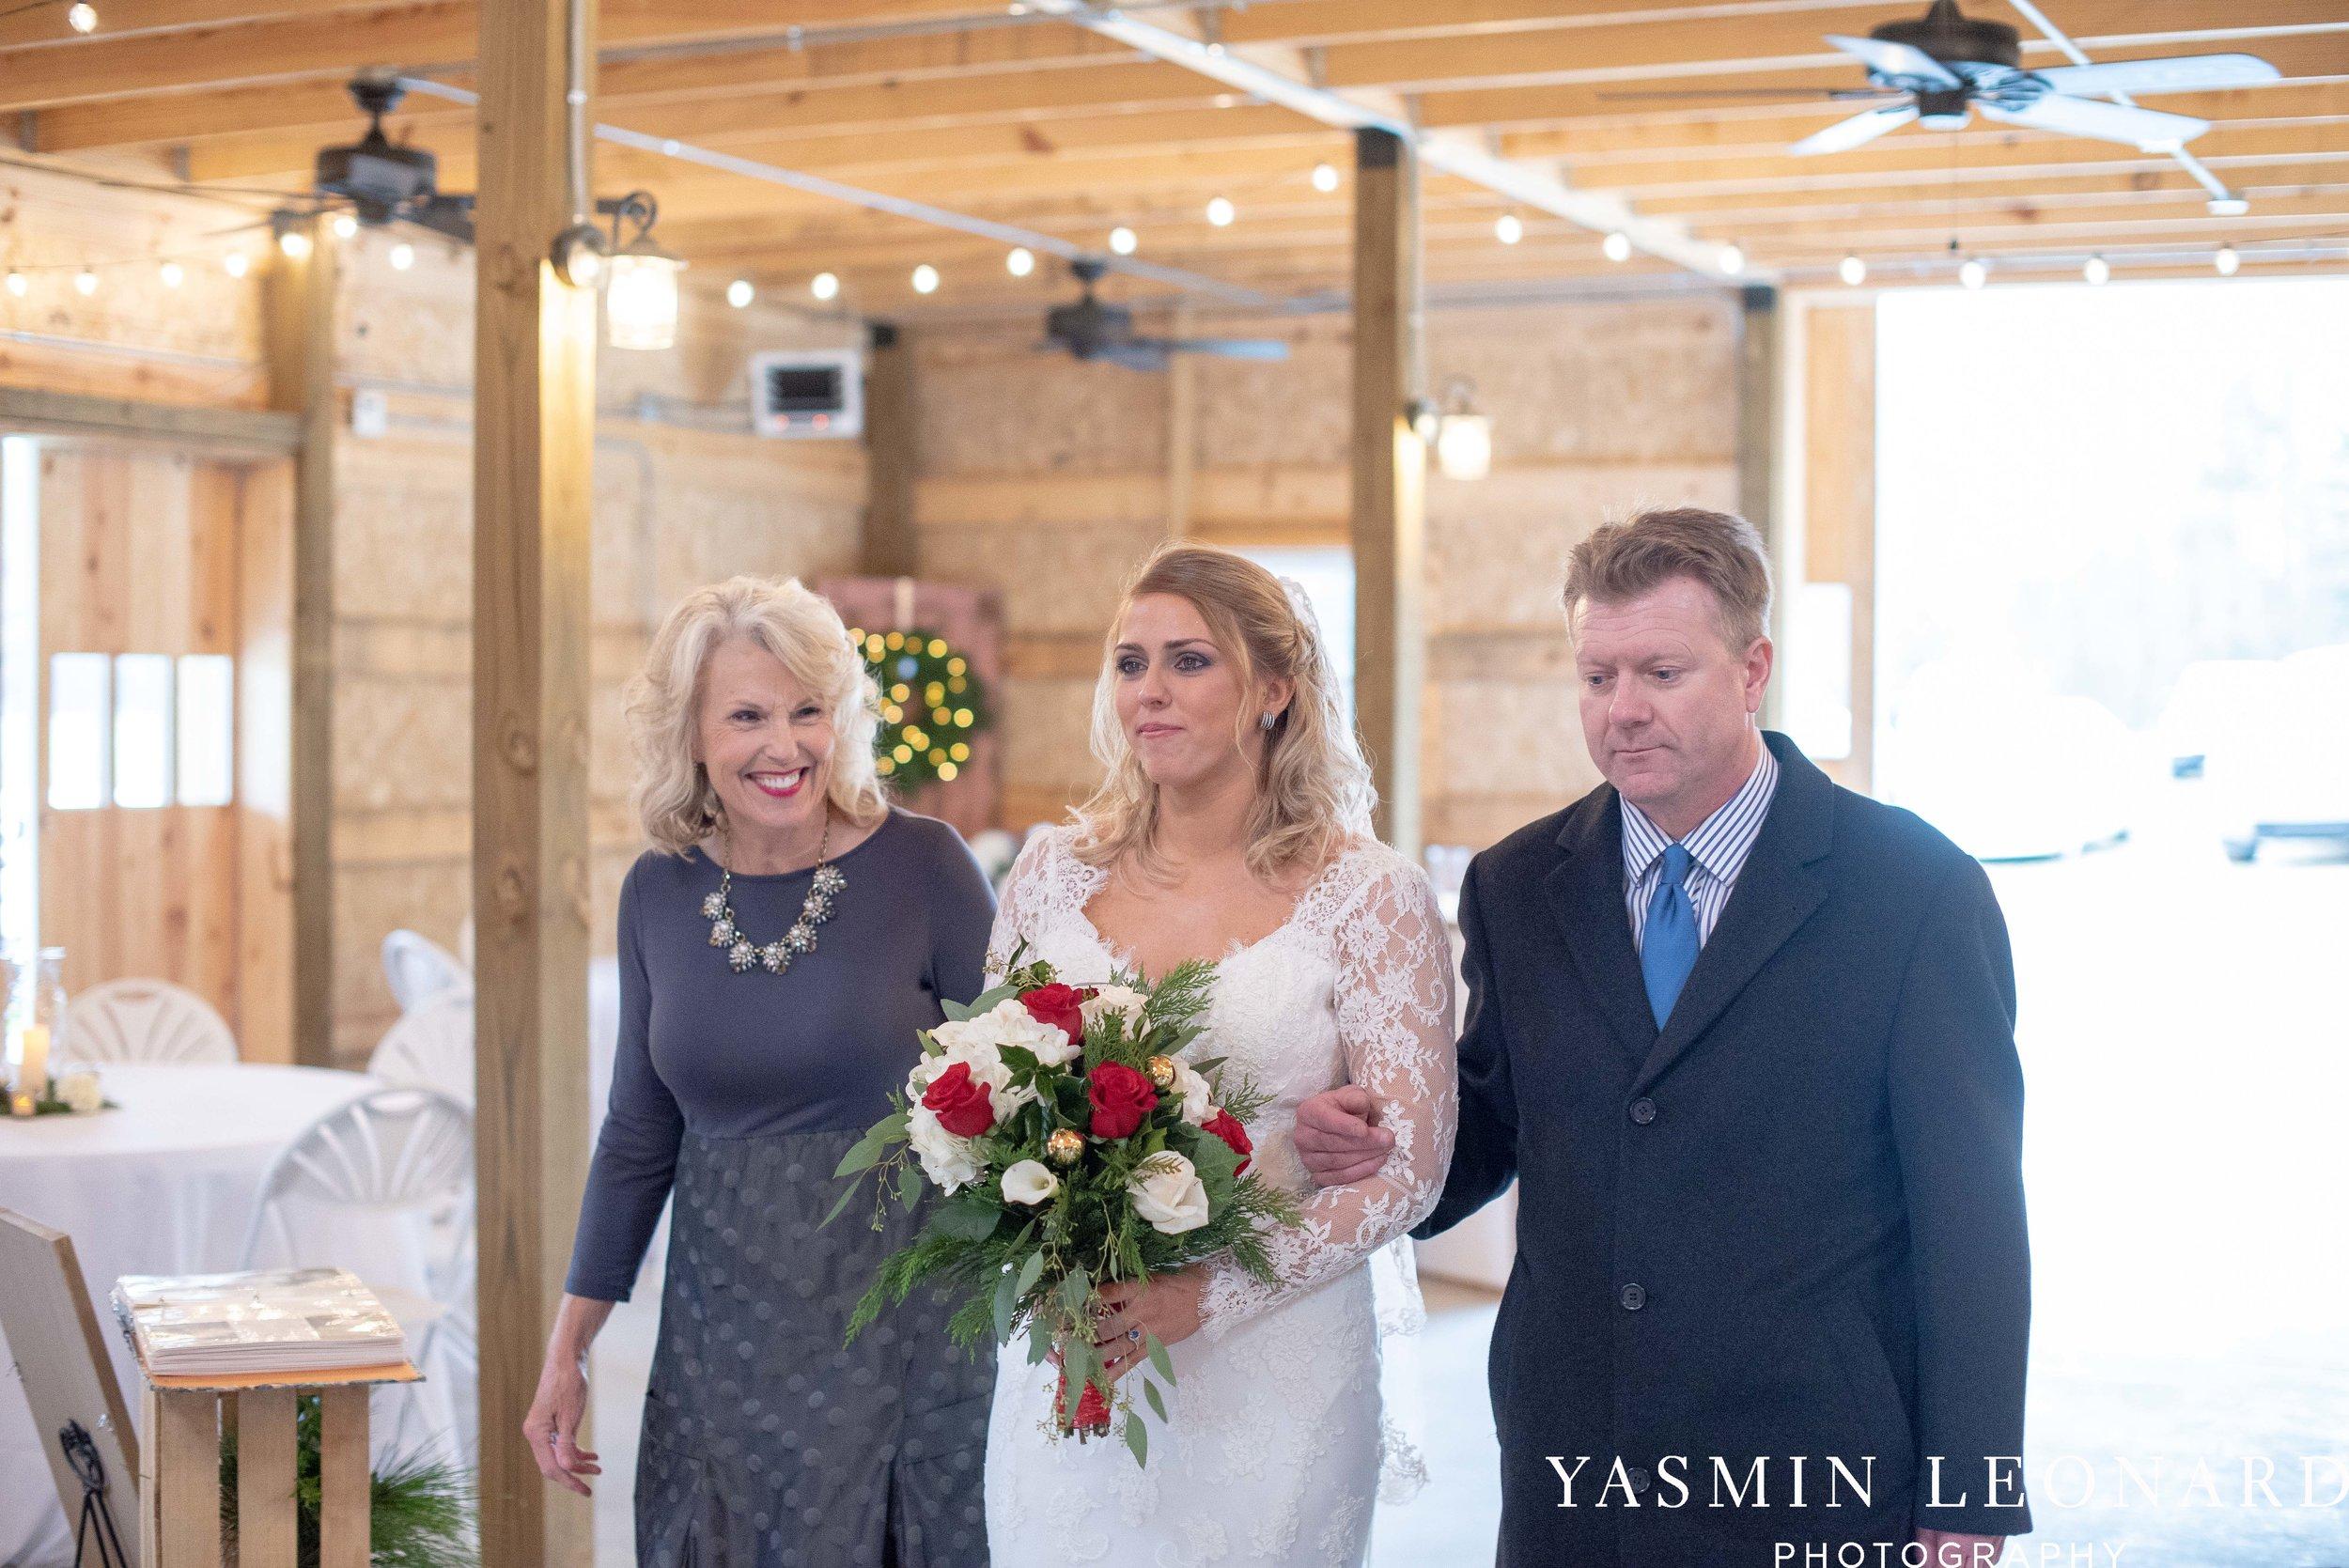 Secret Meadows at Green Dell Farm, NC Barns, NC Wedding Venues, Triad, NC, NC Wedding Photography, Triad Wedding Venues, Affordable Wedding Venues, NEW Wedding Venues, Christmas Weddings-18.jpg